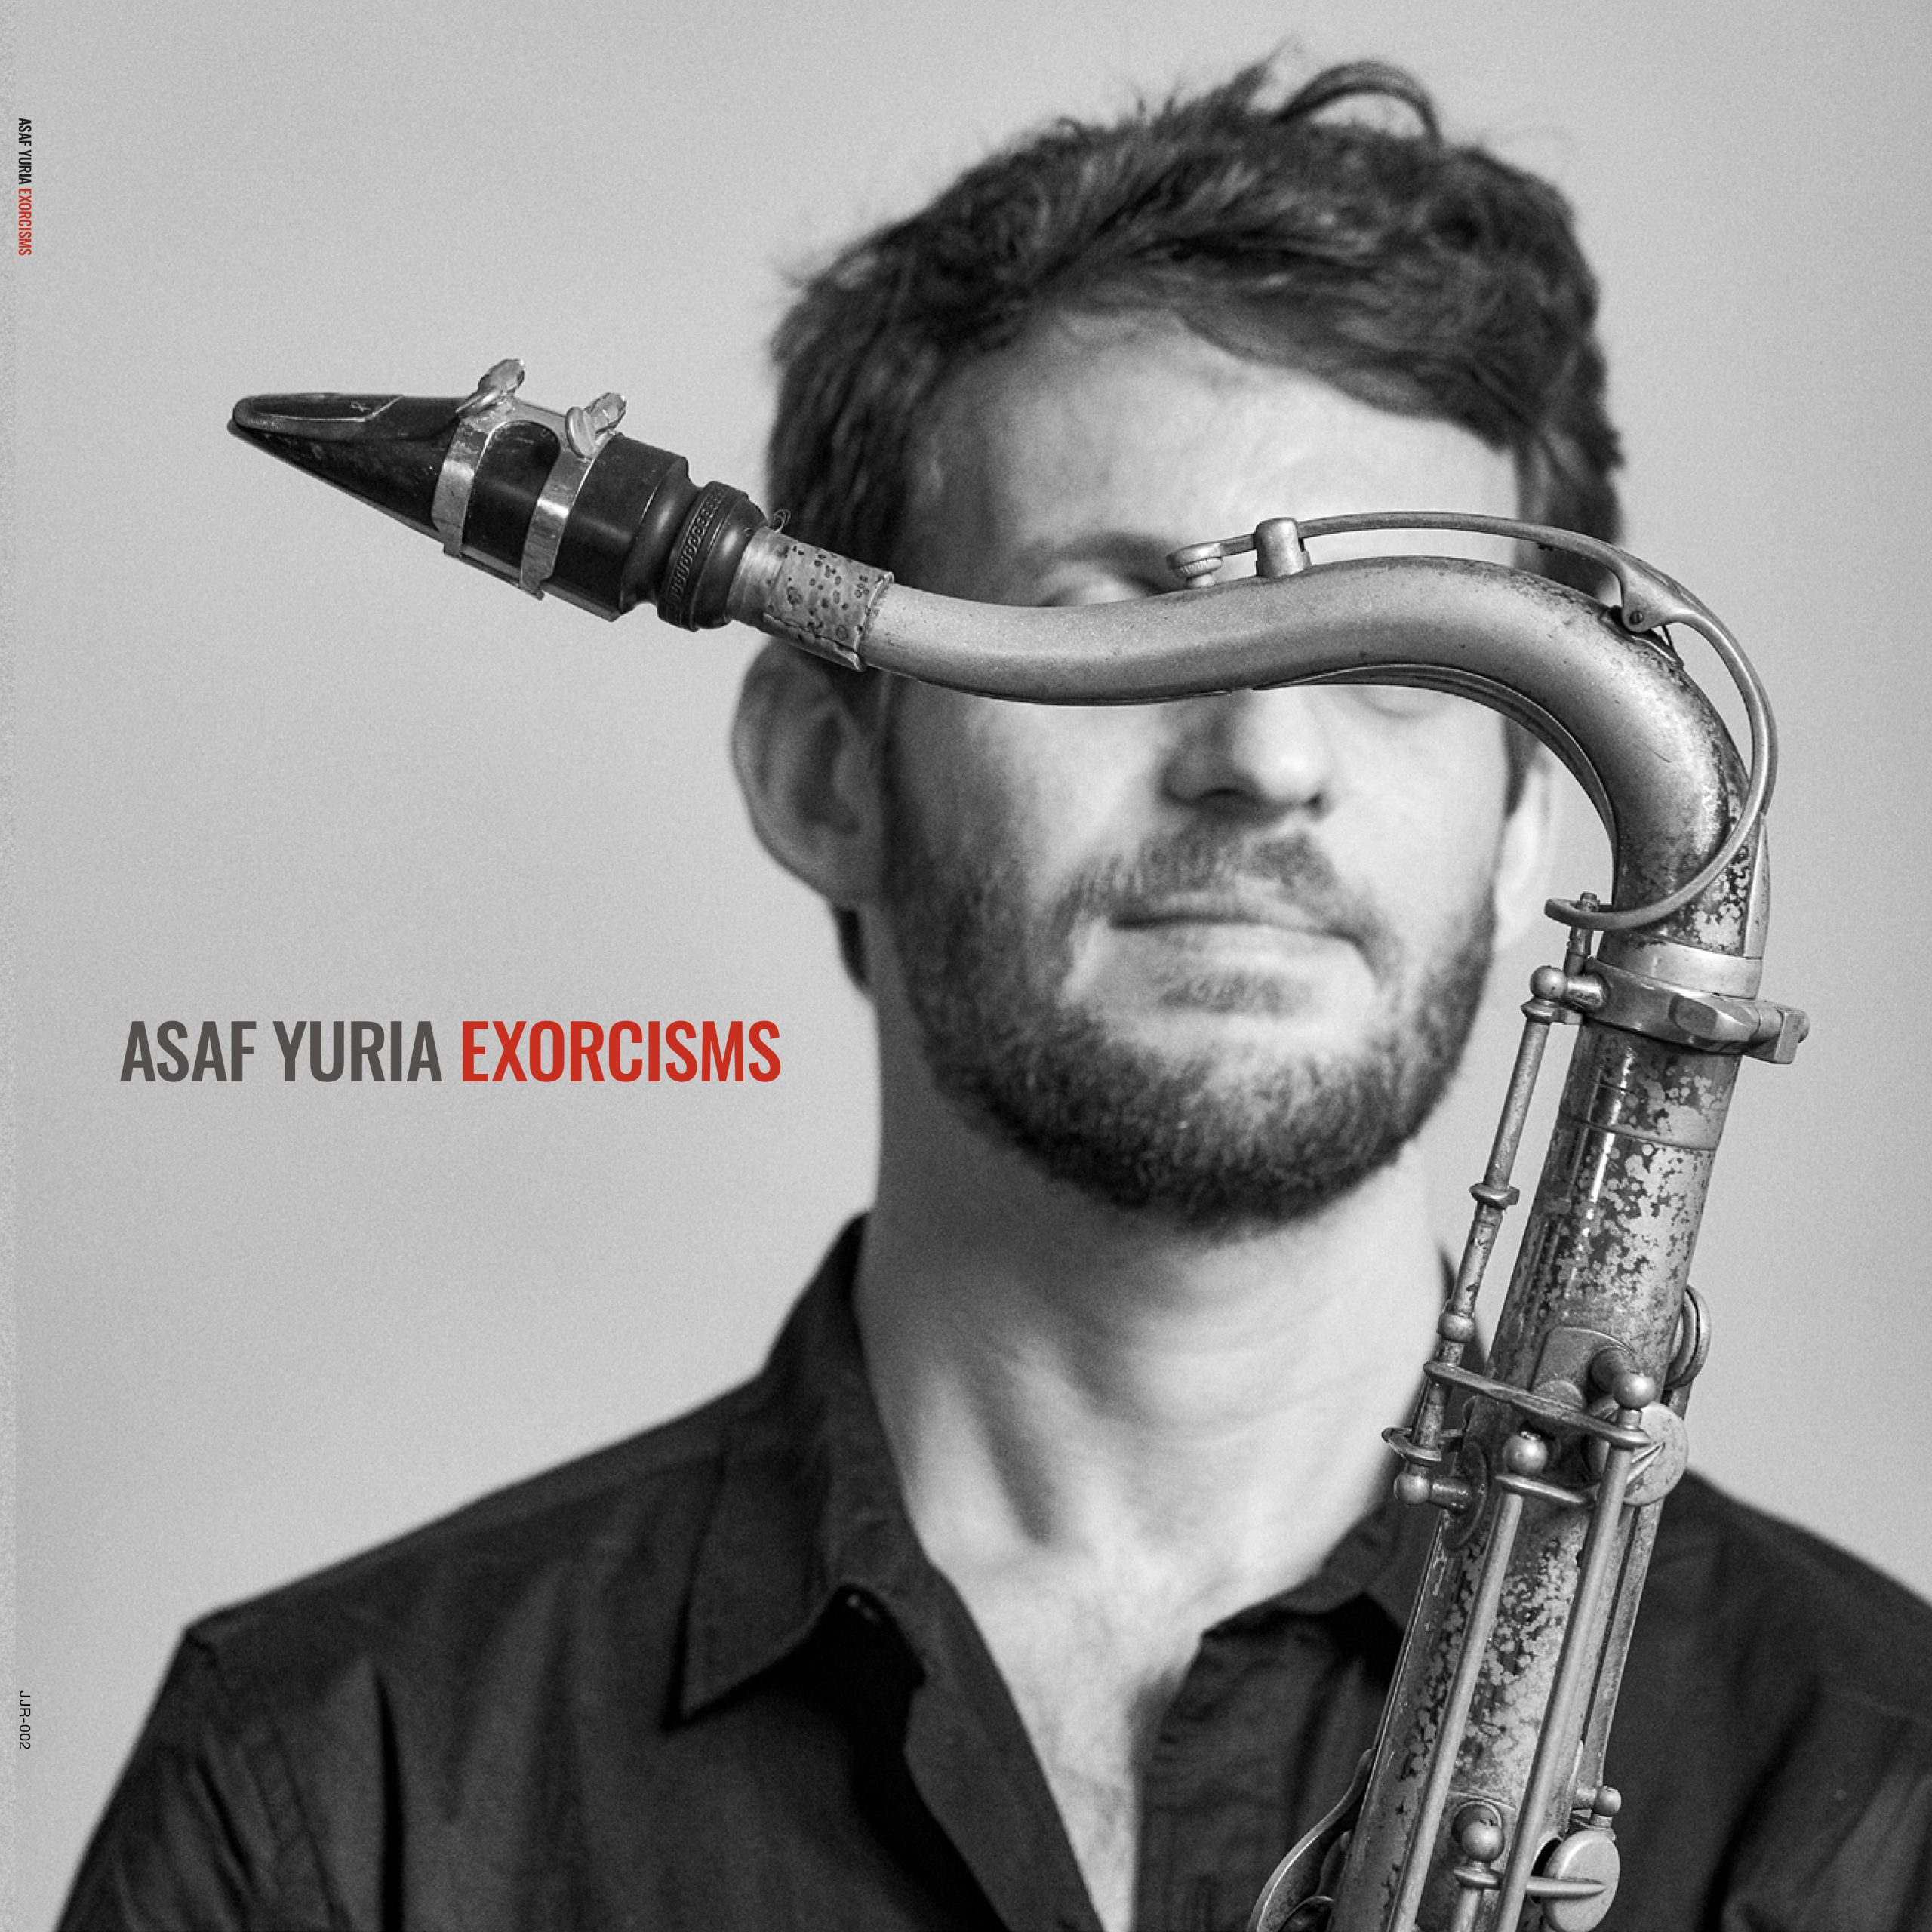 NEW RELEASE: Israeli tenor saxophonist Asaf Yuria presents his sophomore album 'Exorcisms' due out November 5, 2021 via Jojo Records